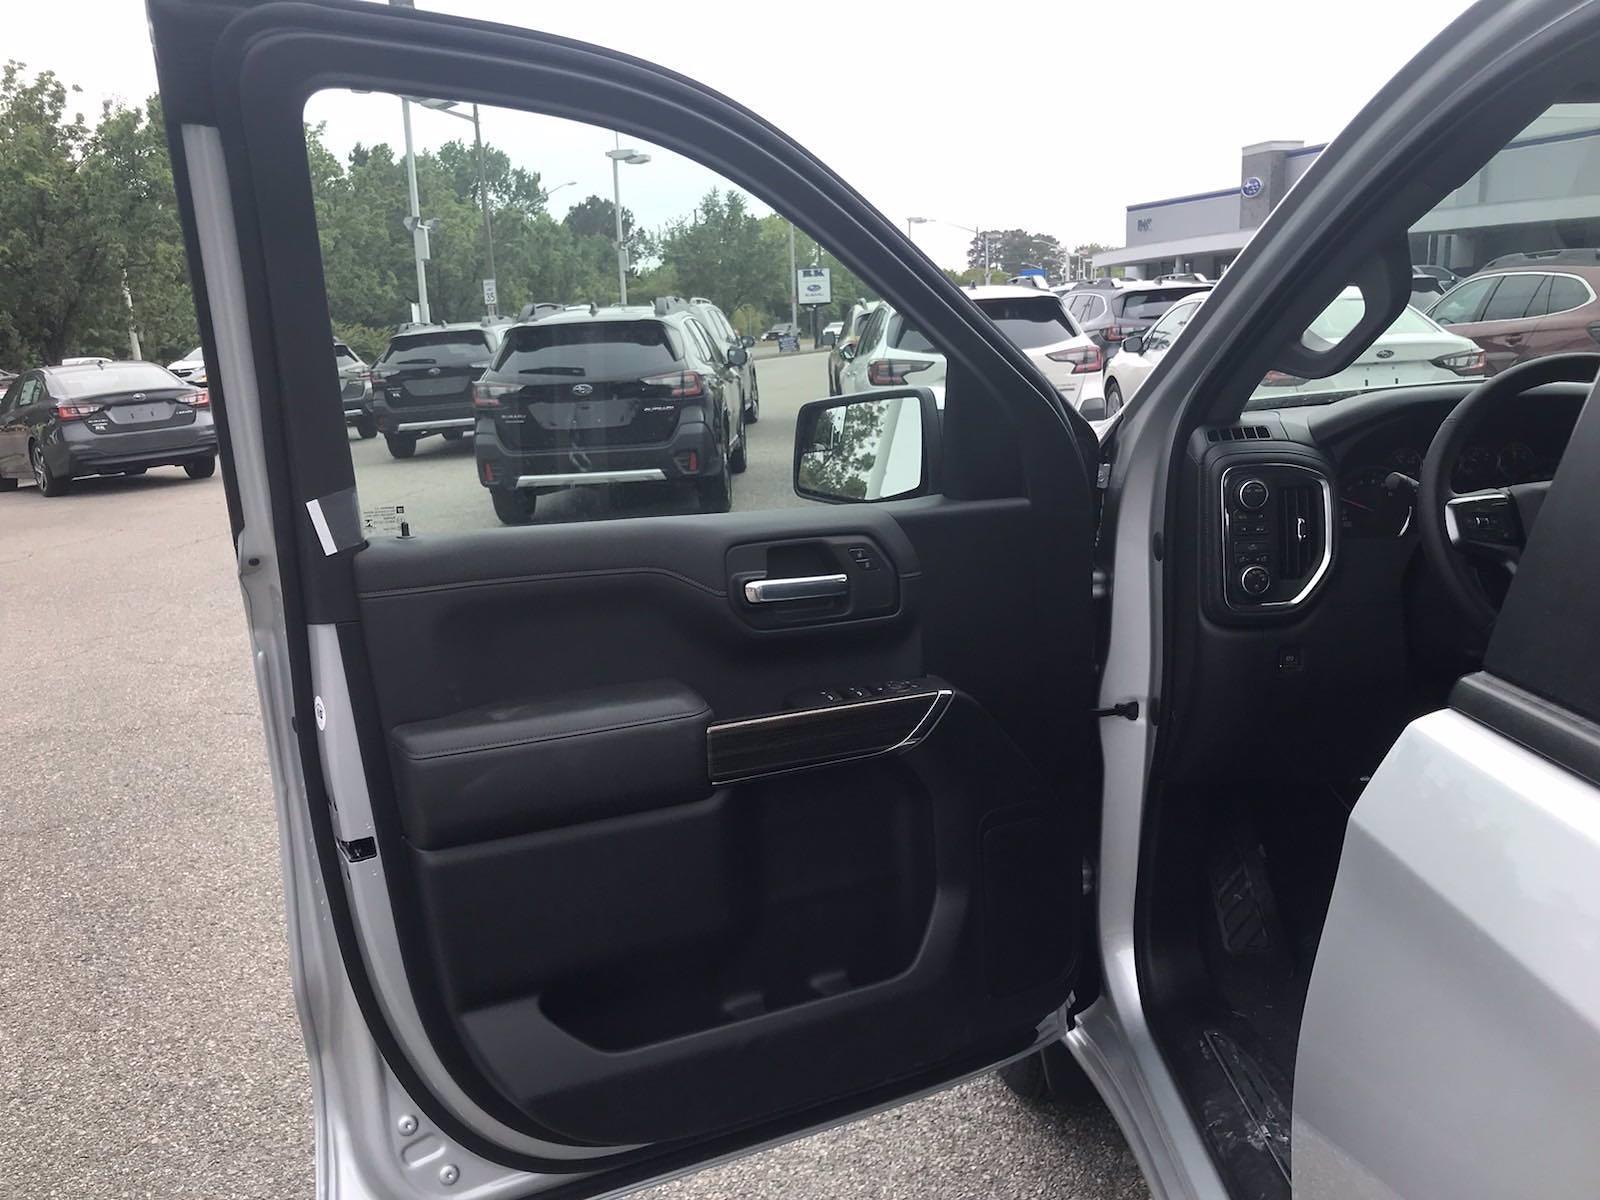 2021 Chevrolet Silverado 1500 Crew Cab 4x4, Pickup #217302 - photo 19